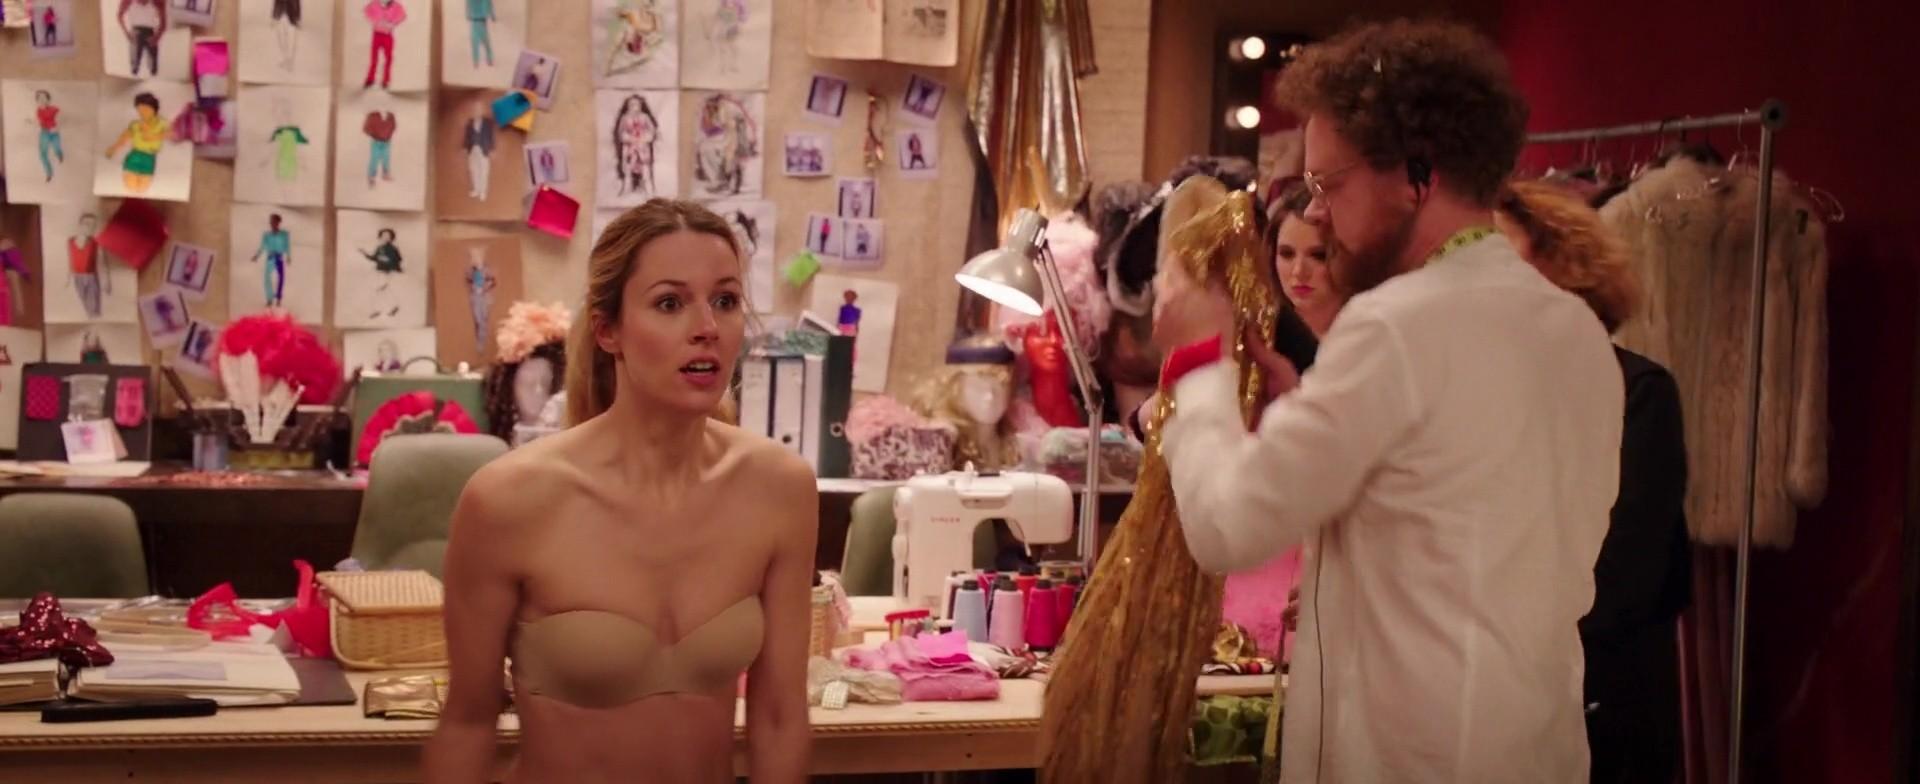 Sideboobs Topless Alona Tal naked photo 2017